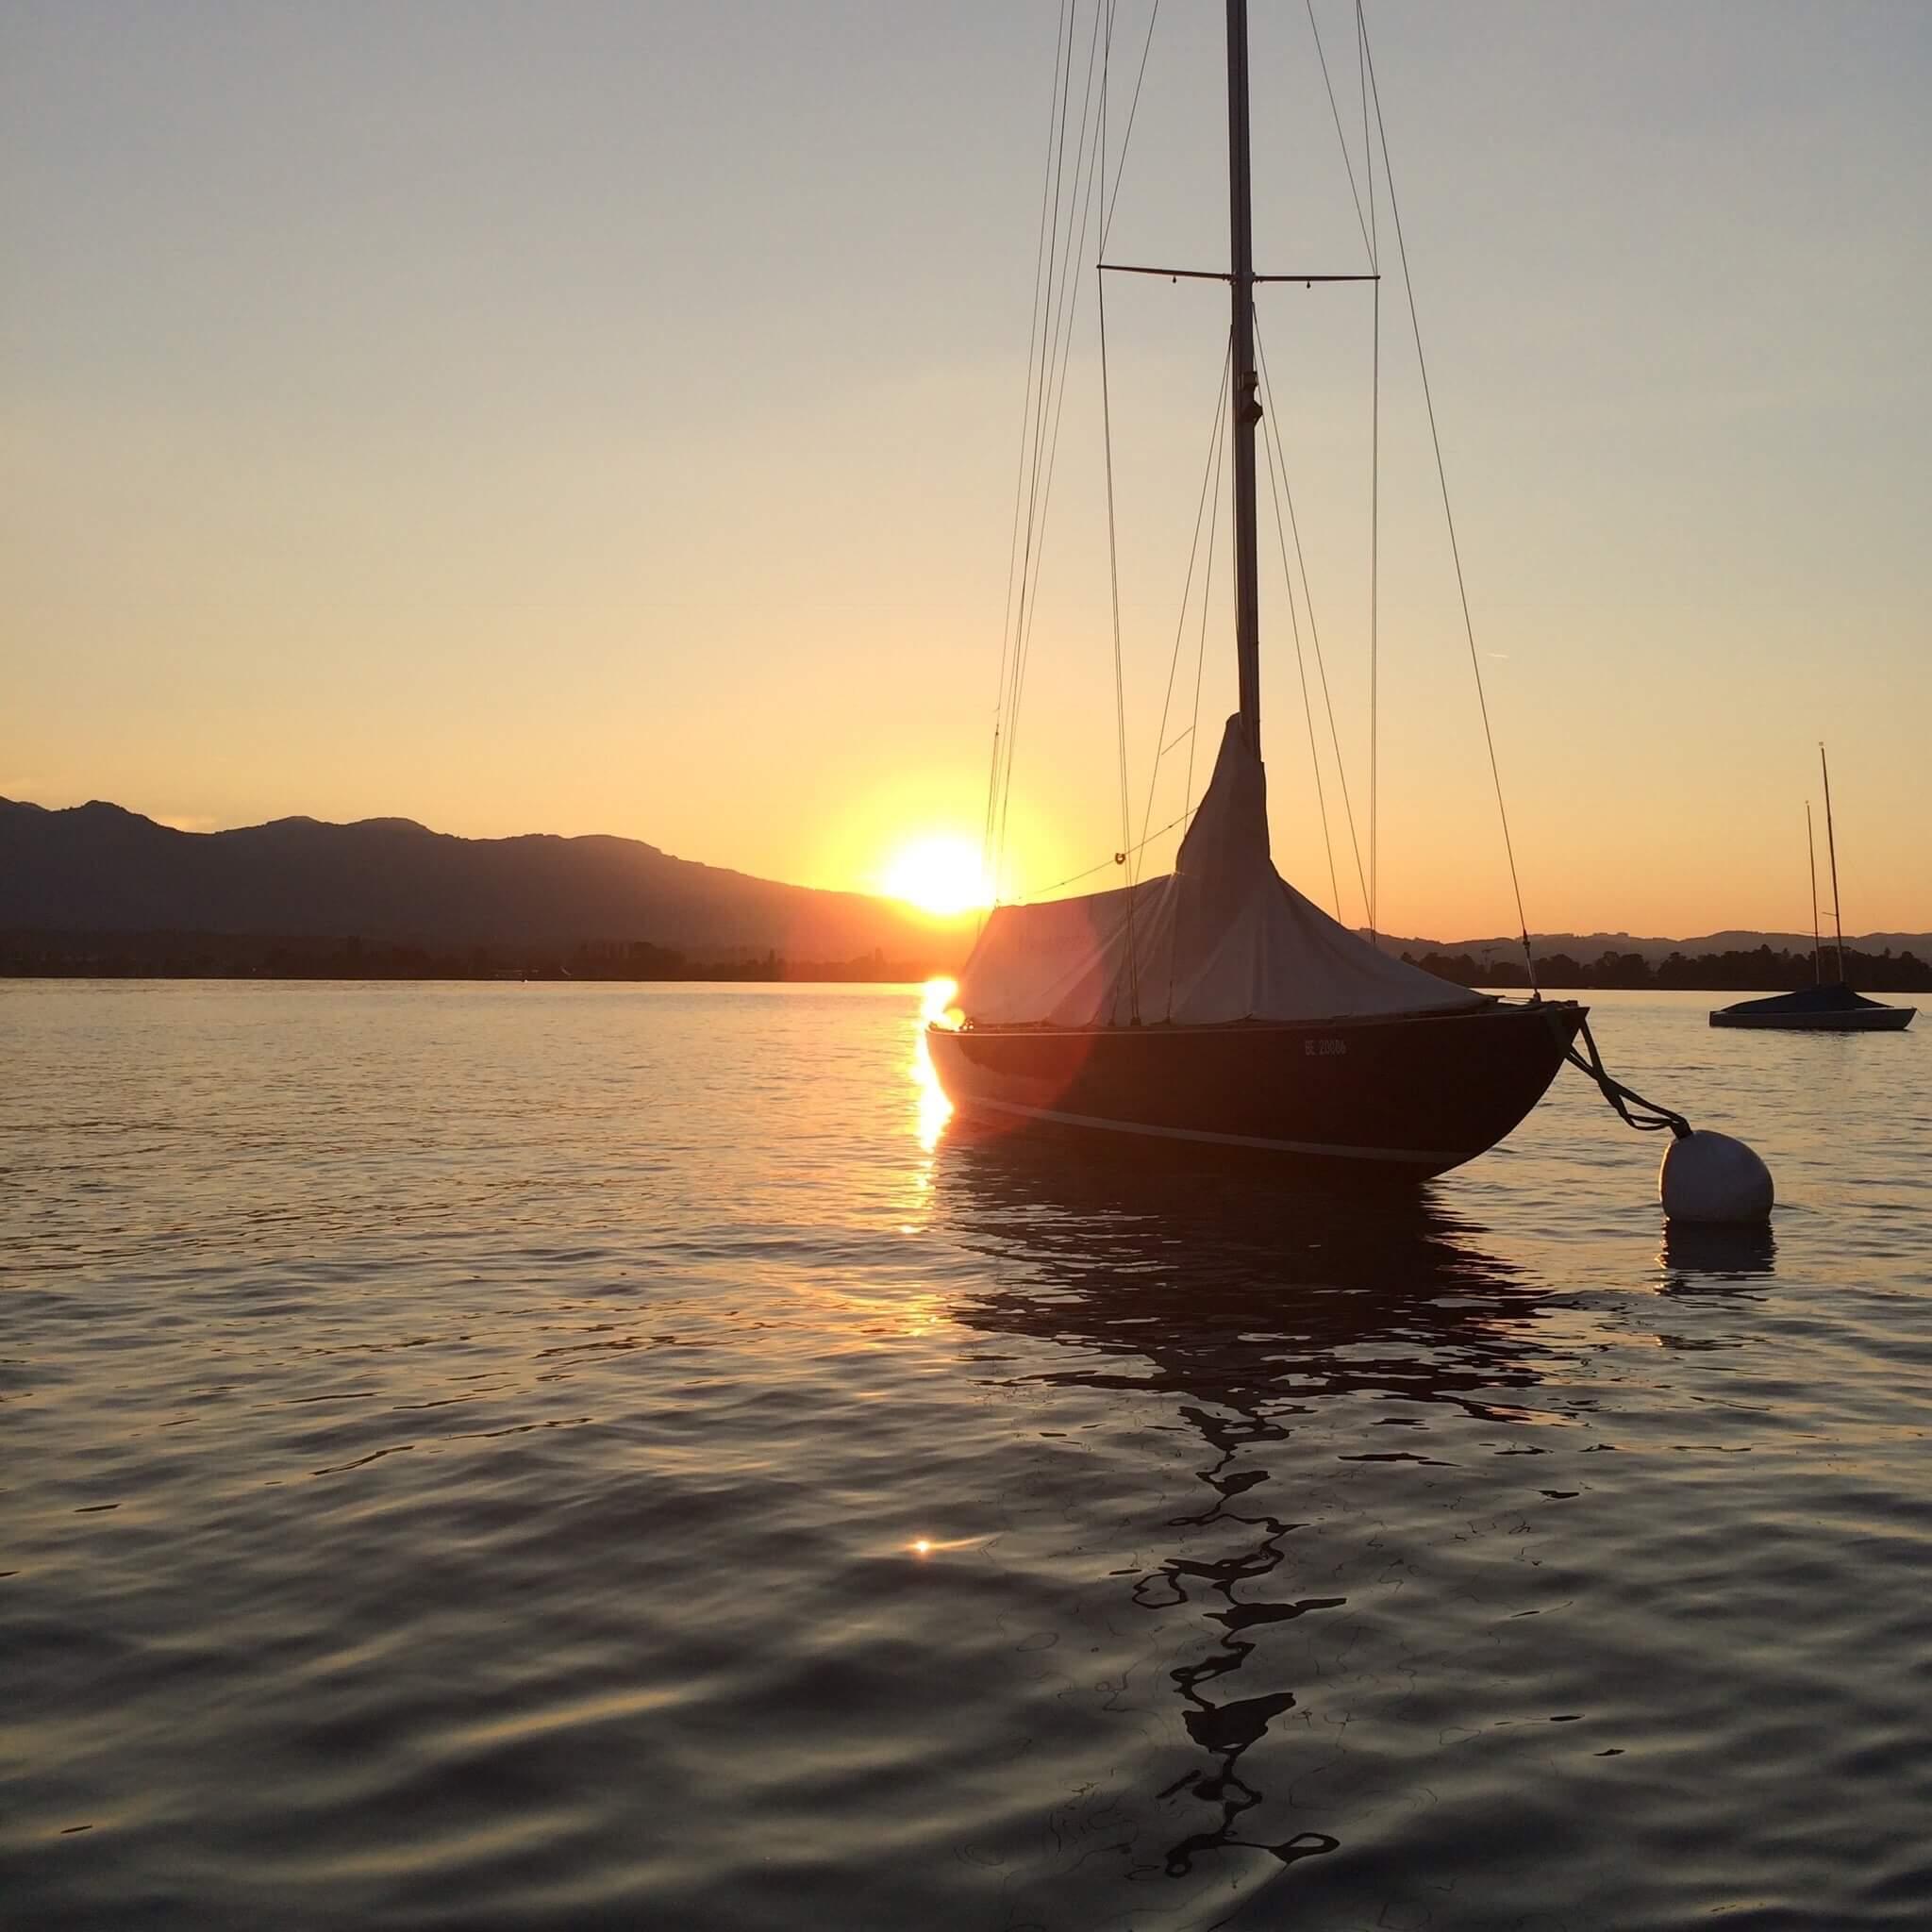 spiez-segelschule-donnerstag-abend-thunersee-segeln-sonnenuntergang-sommer-segelschiff